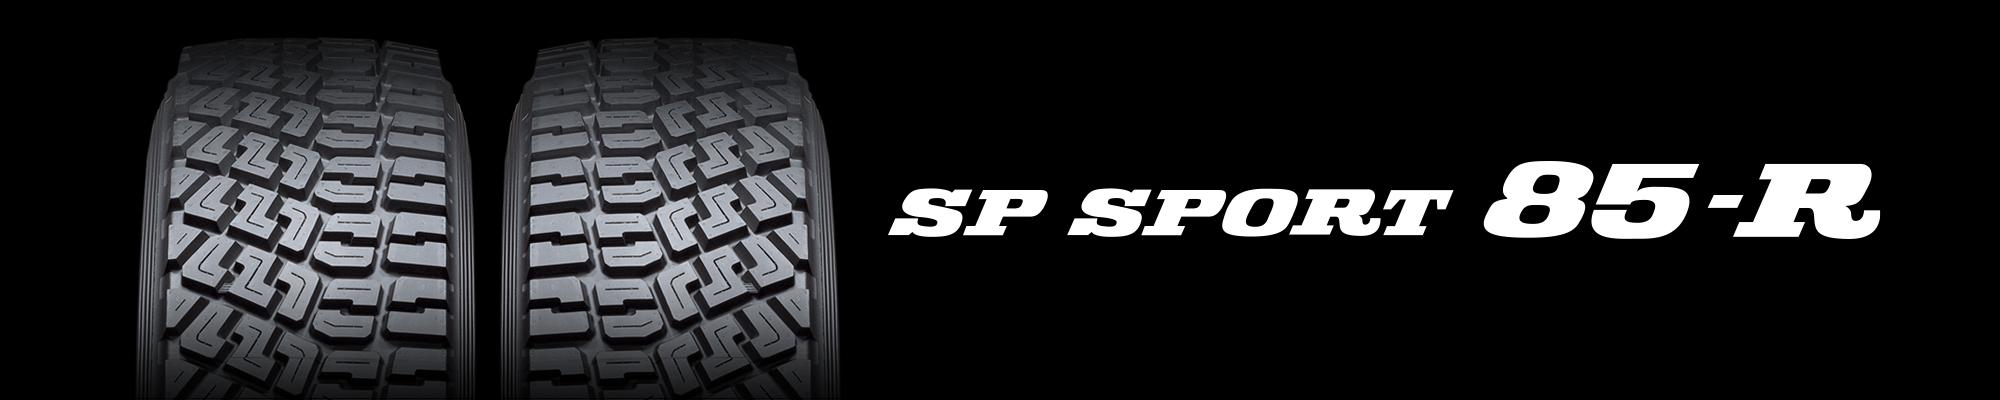 SP SPORT 85-R